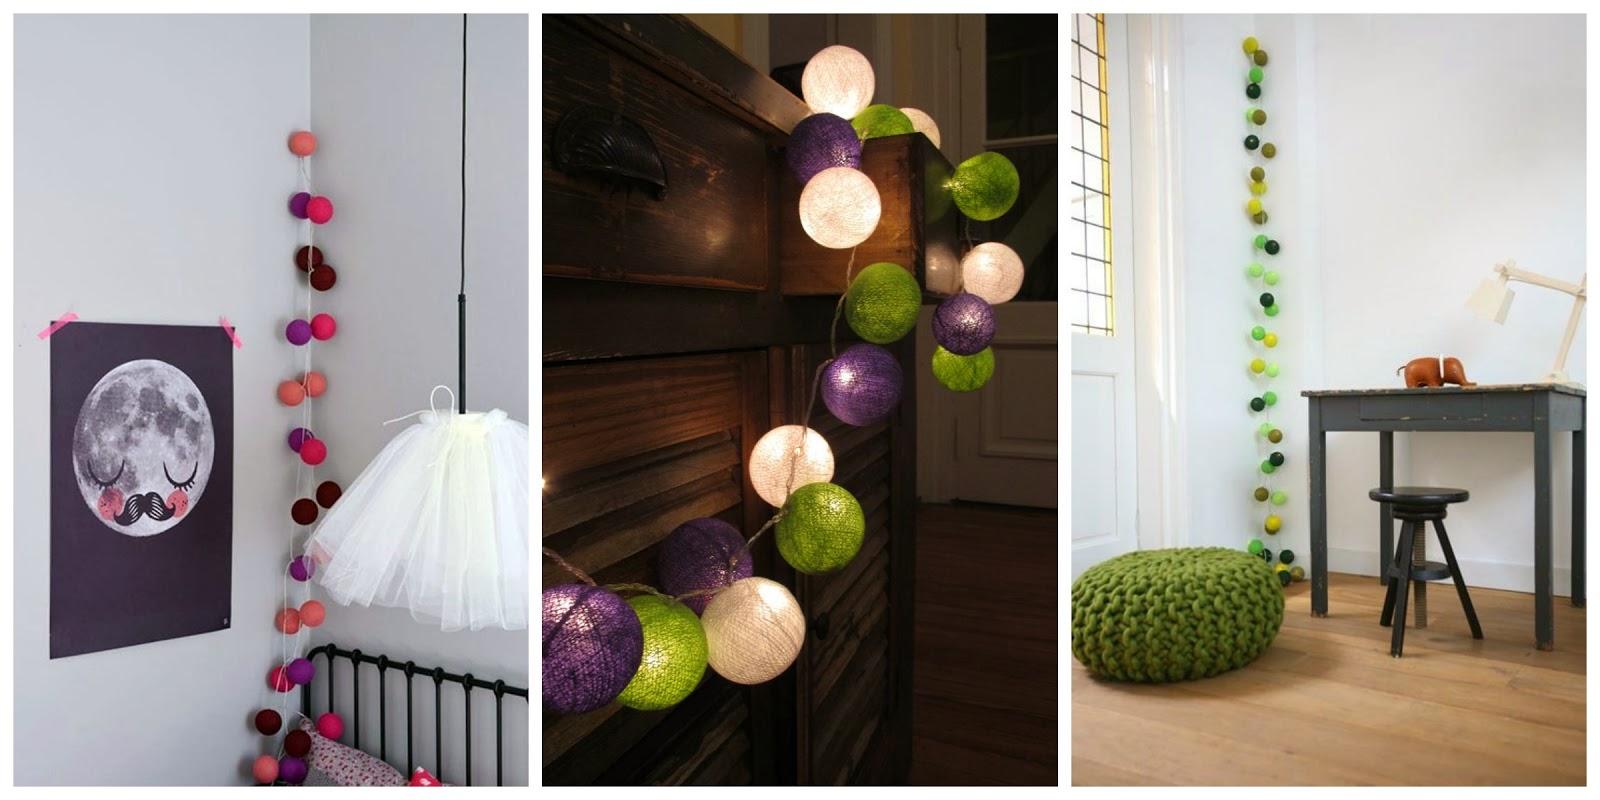 Kilika hecho a mano diy guirnaldas de luces hechas a mano - Guirnaldas de luces ...